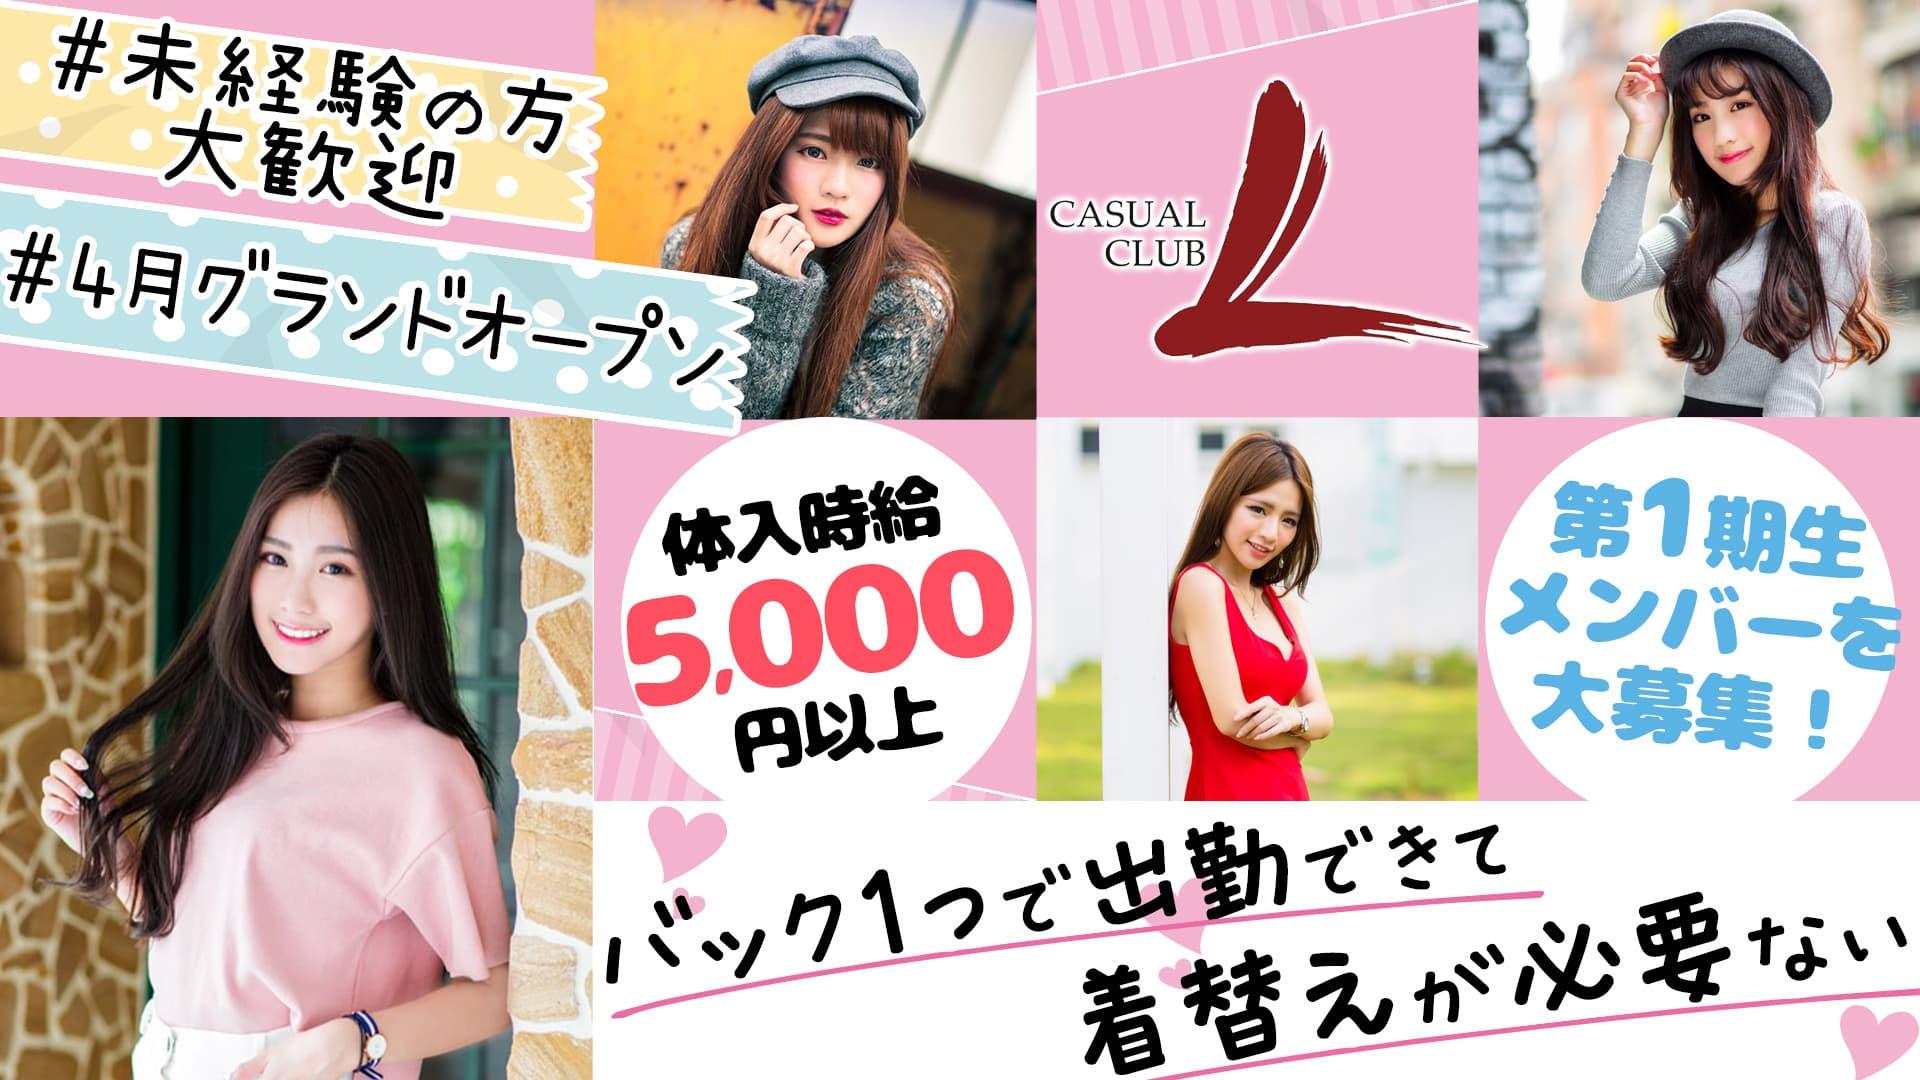 Casual club L(エル)【公式求人・体入情報】 下通りキャバクラ TOP画像